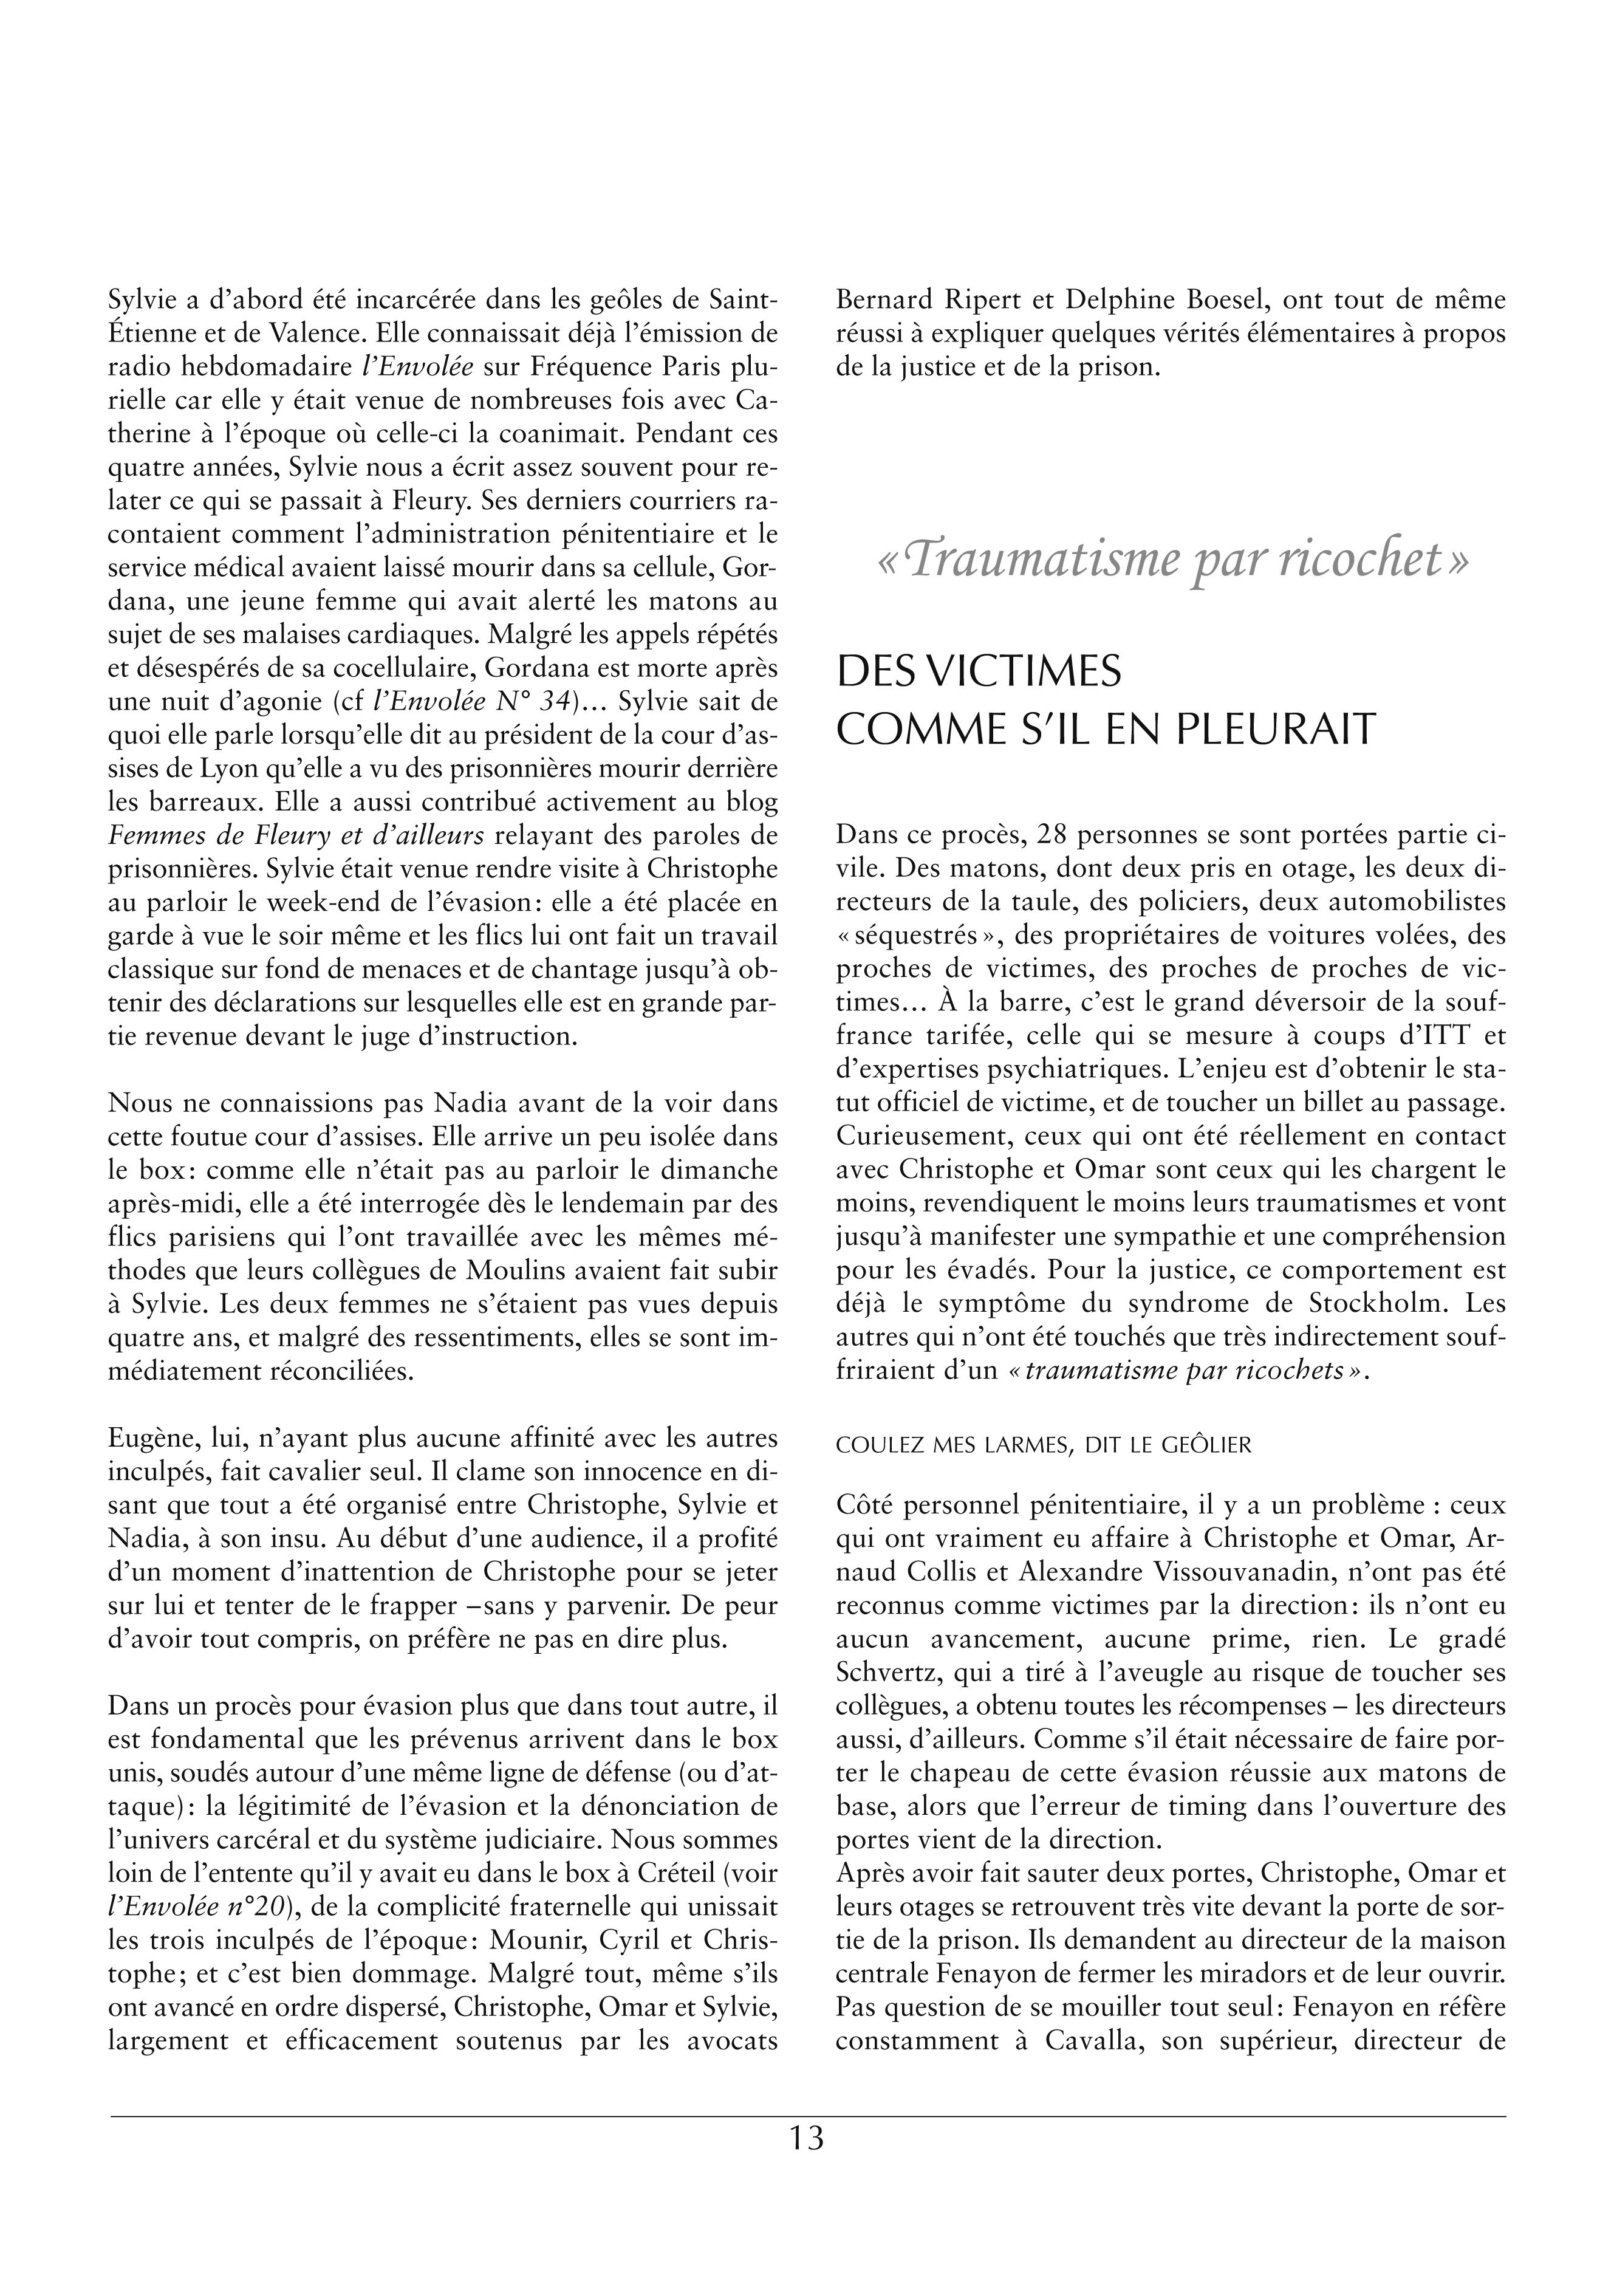 lenvolee_35 1_Page_13